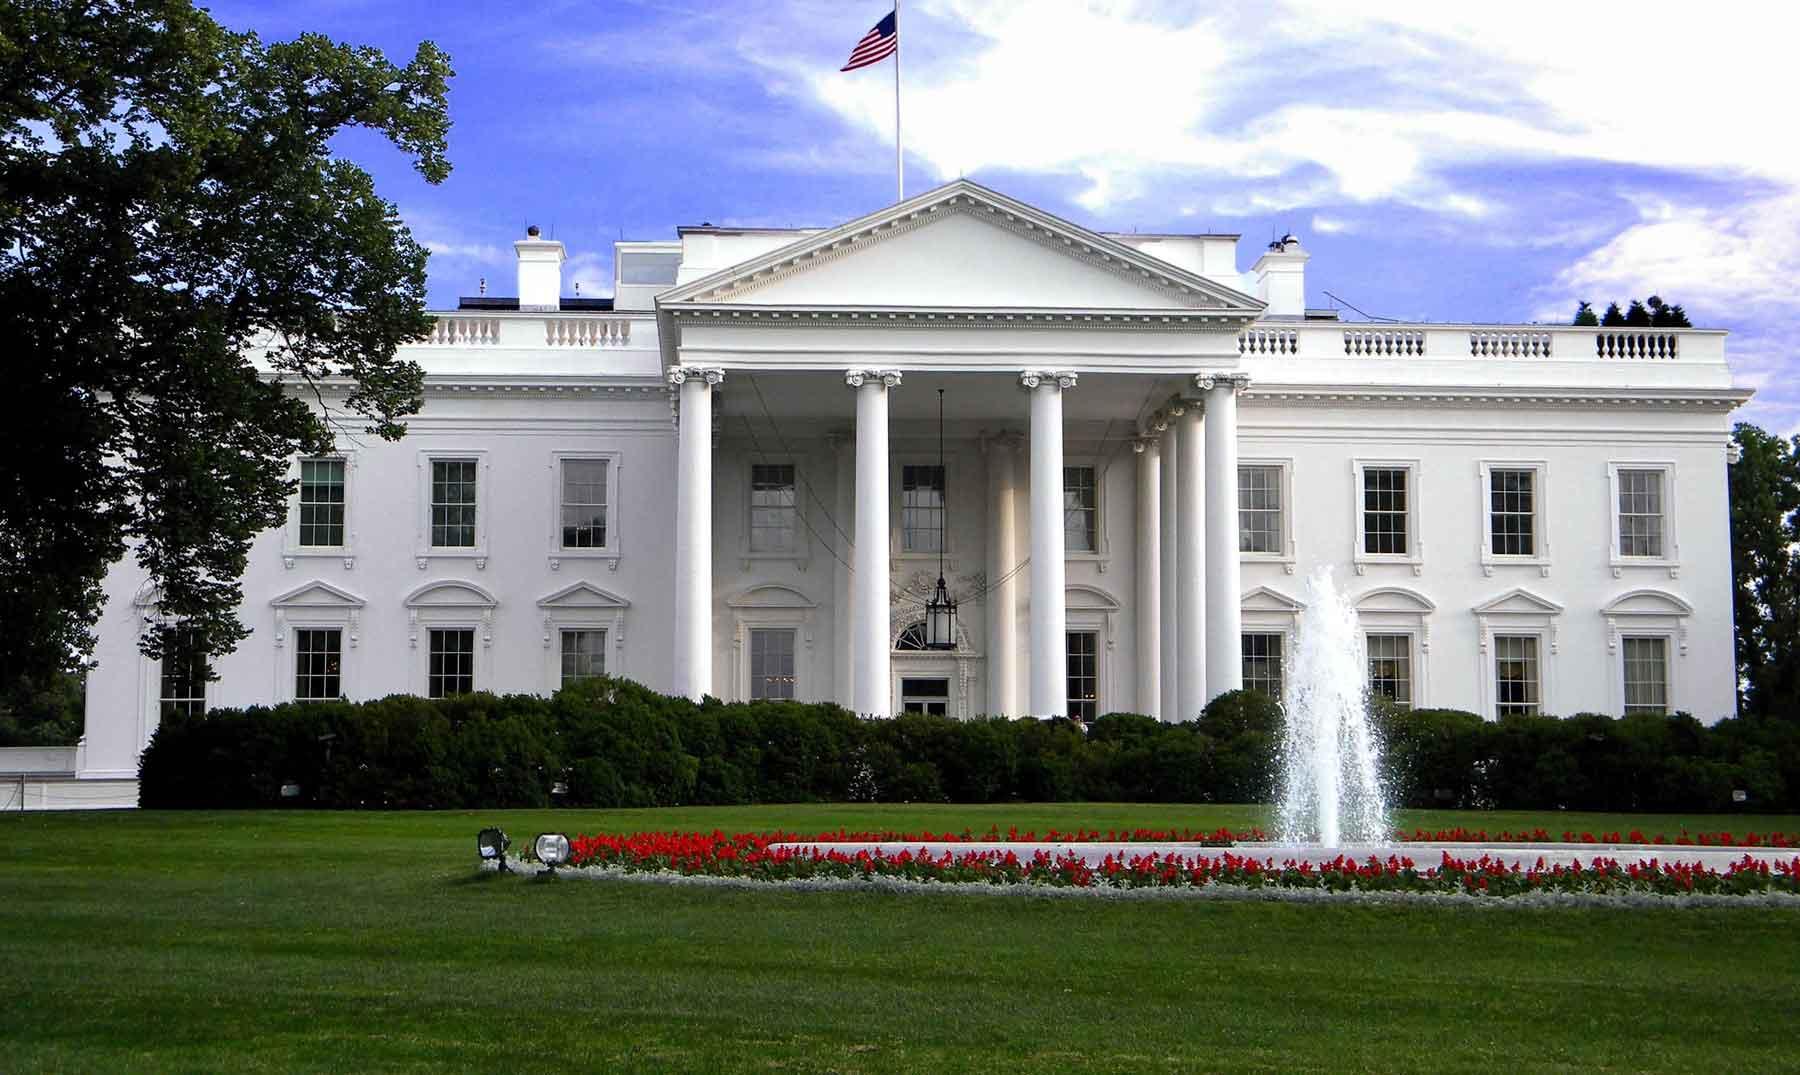 Canal oficial de la Casa Blanca - White House LIVE